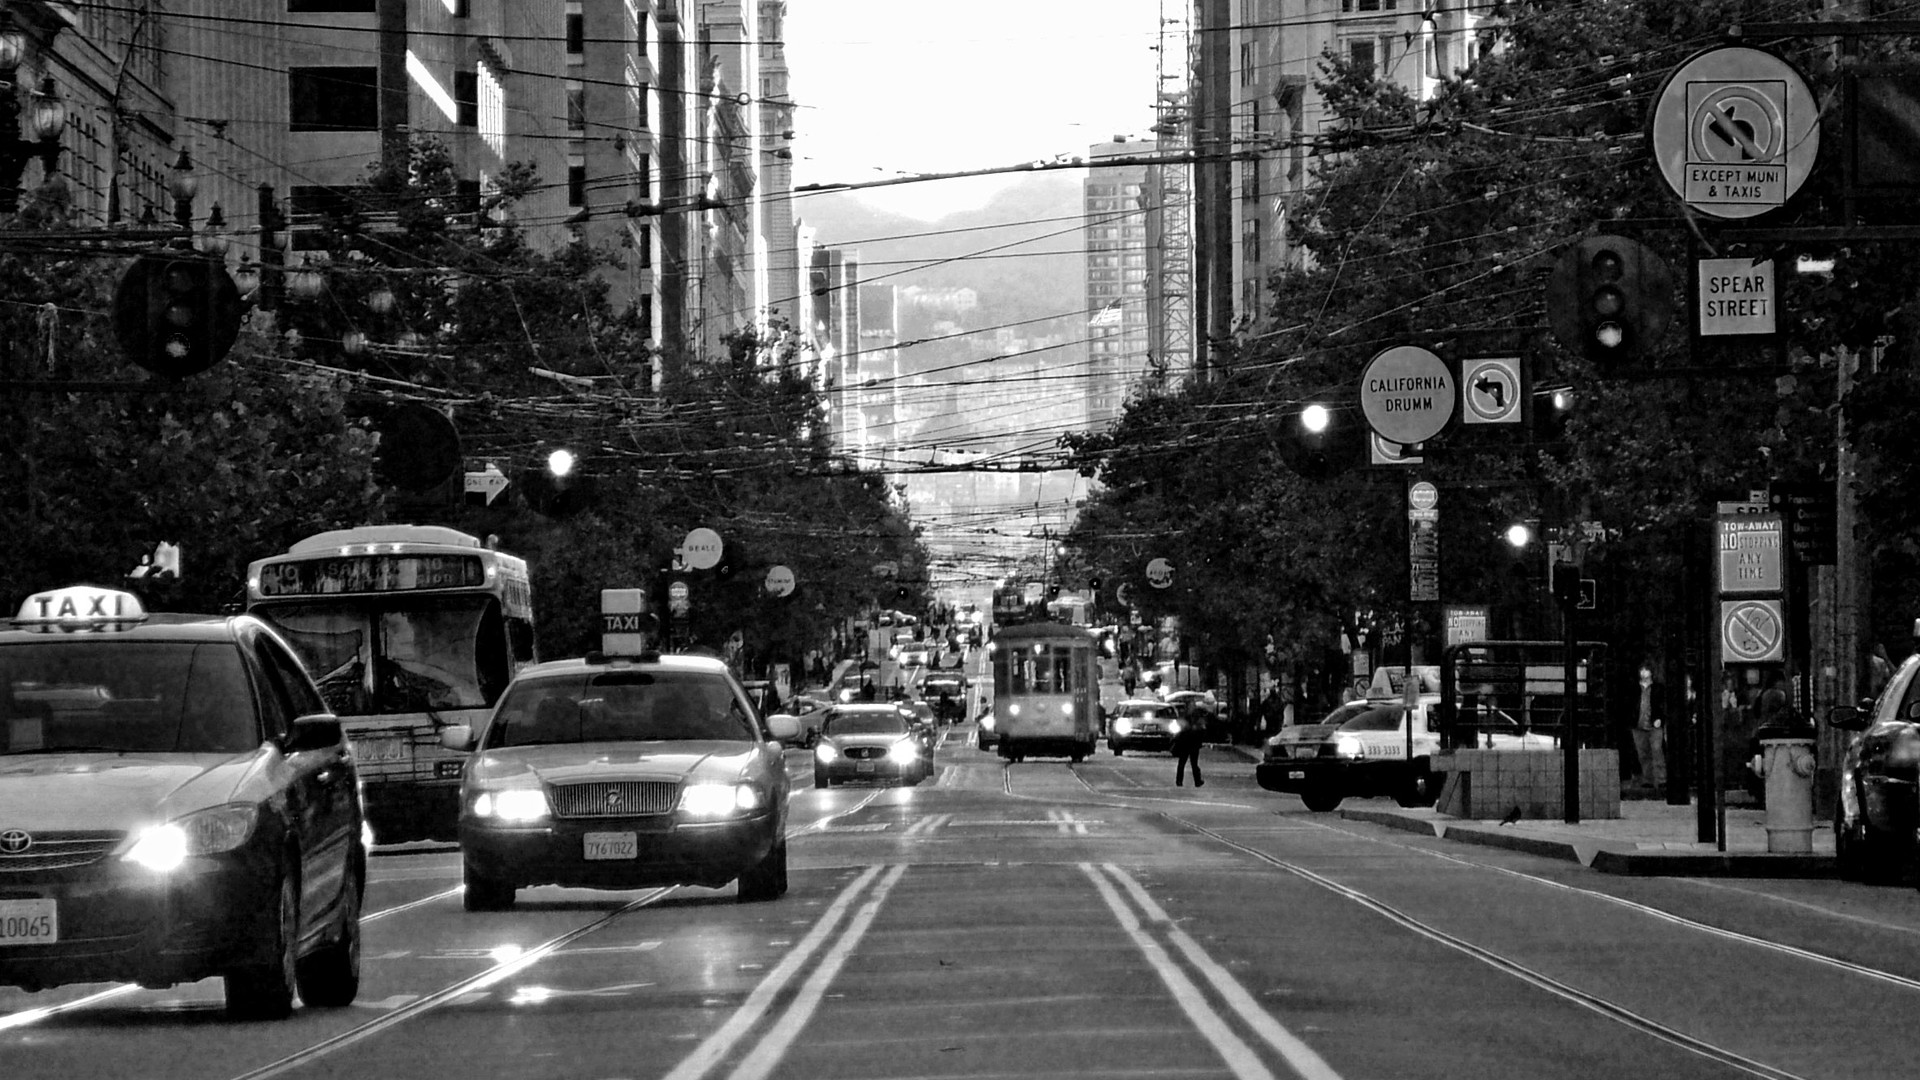 Download City Street Wallpaper HD 1920x1080